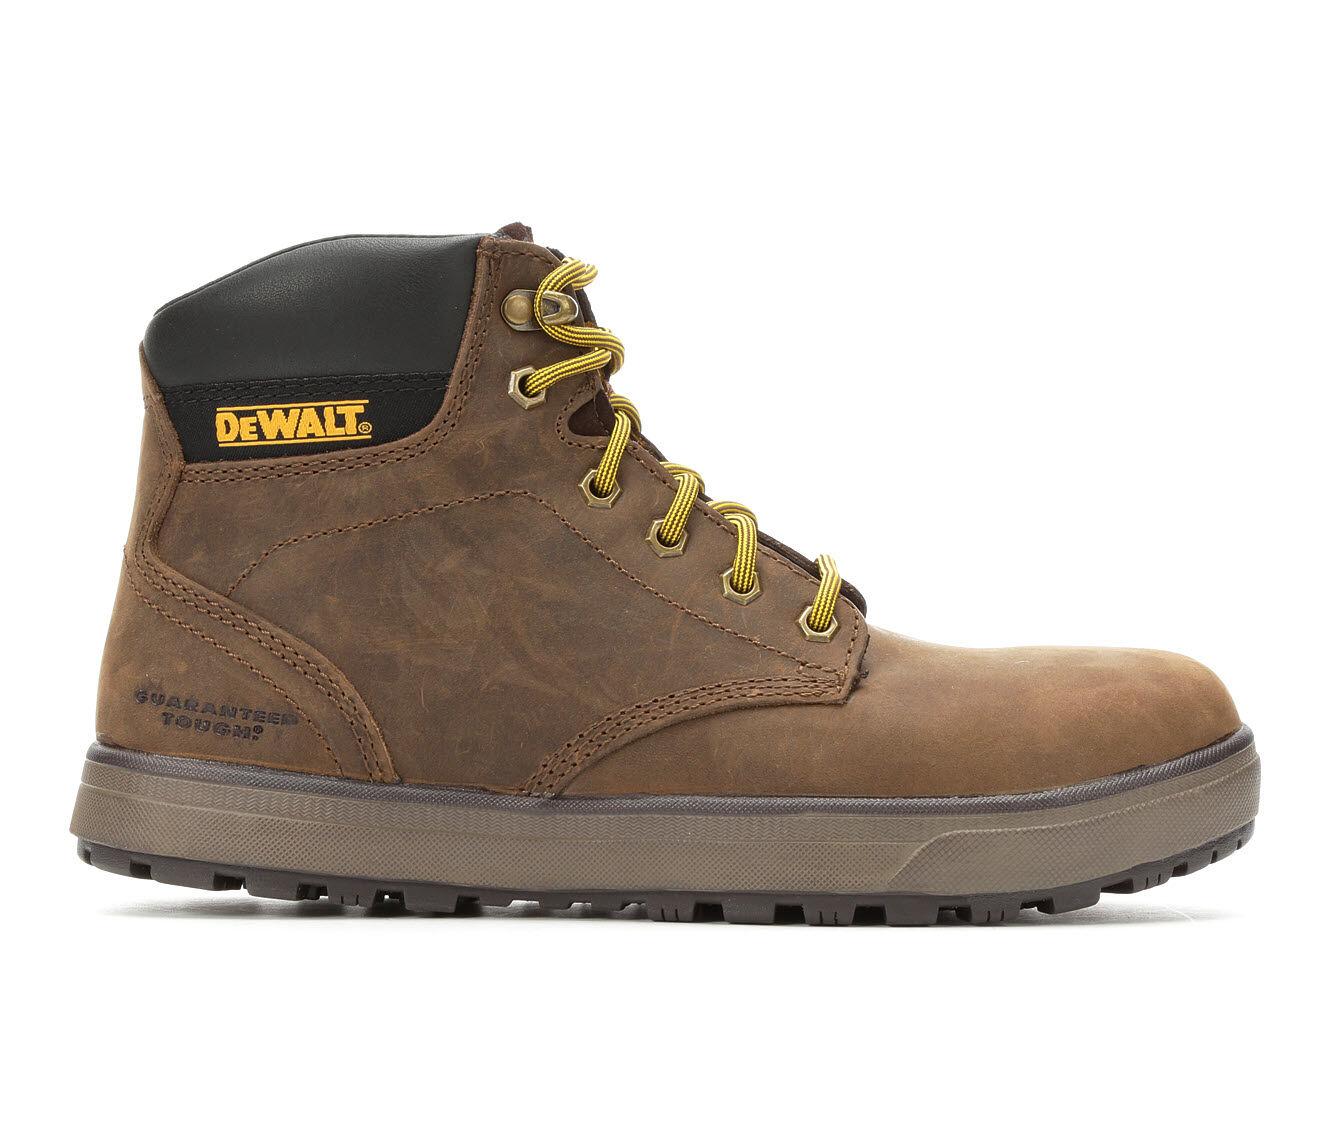 Men's DeWALT Plasma 6 Inch Steel Toe Work Boots Brown